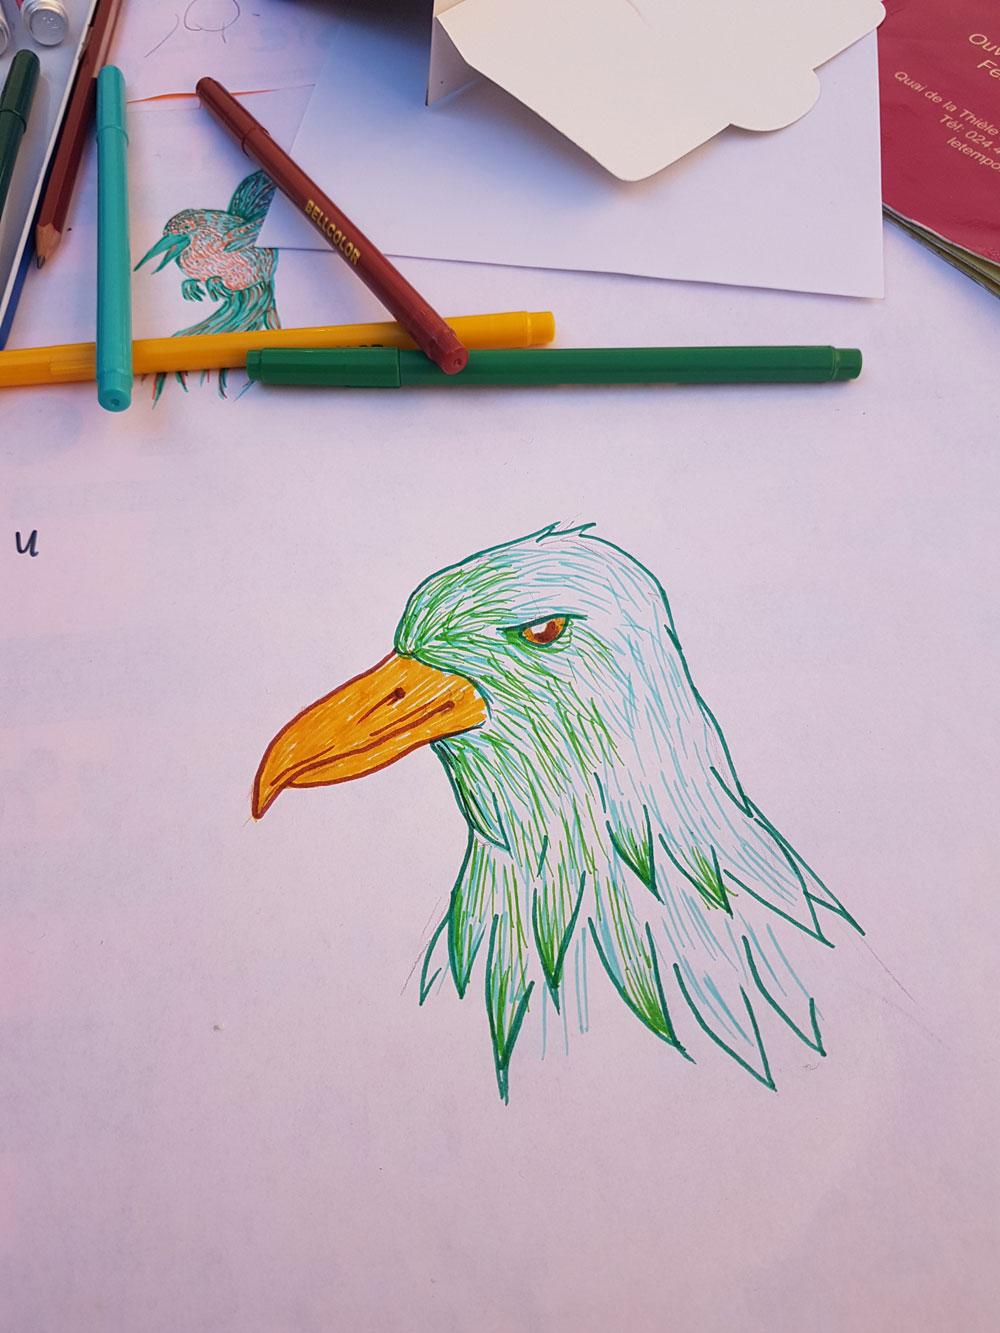 Marcelle-collectif-les-oiseaux-drink-n-draw_09.jpg